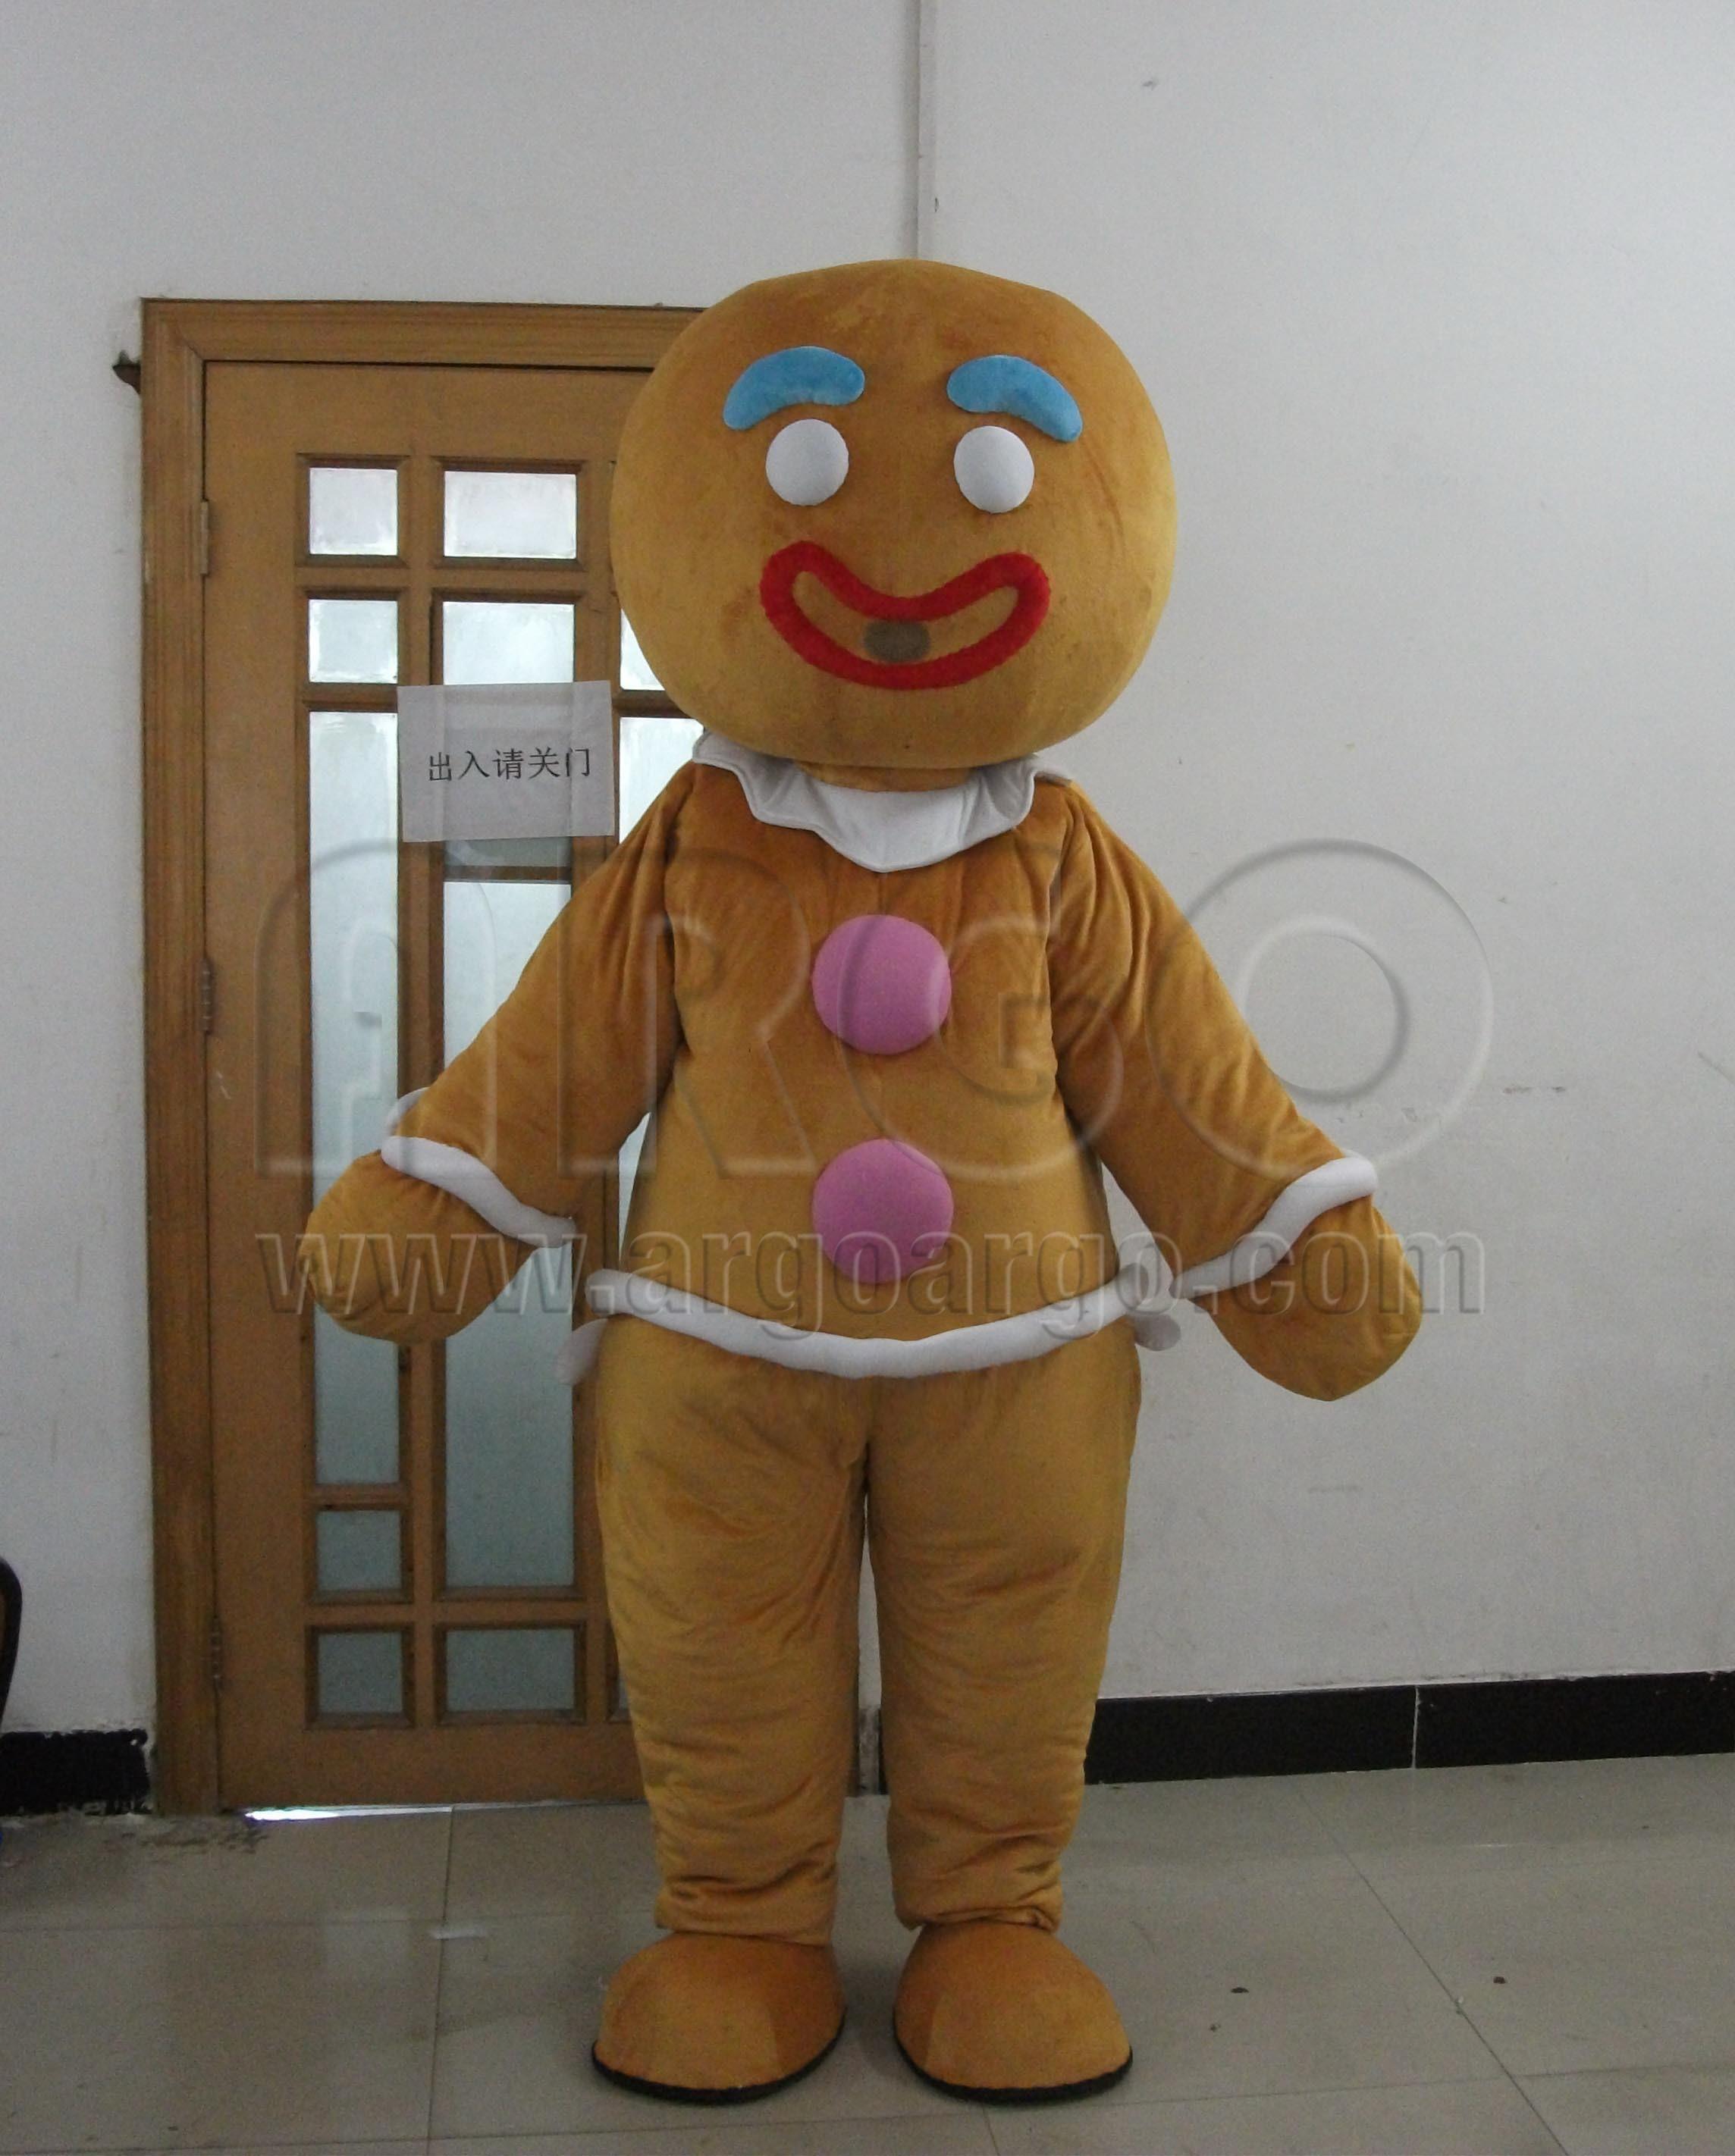 Ginger Bread Man